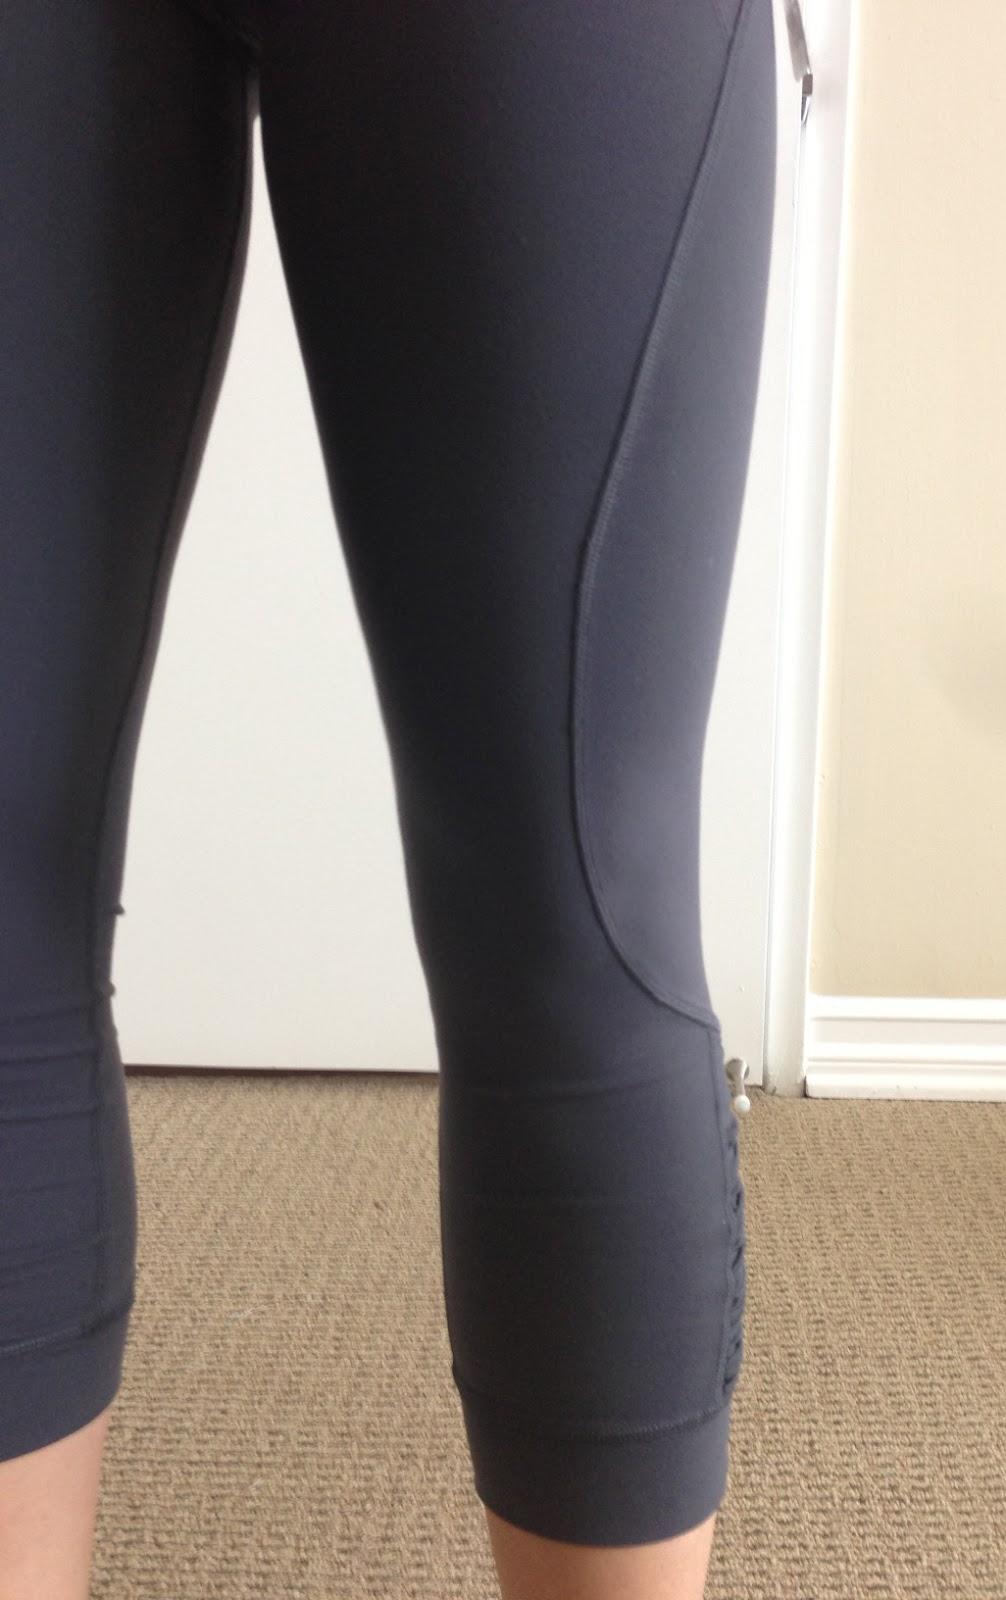 displaying images for high school yoga pants foto bugil